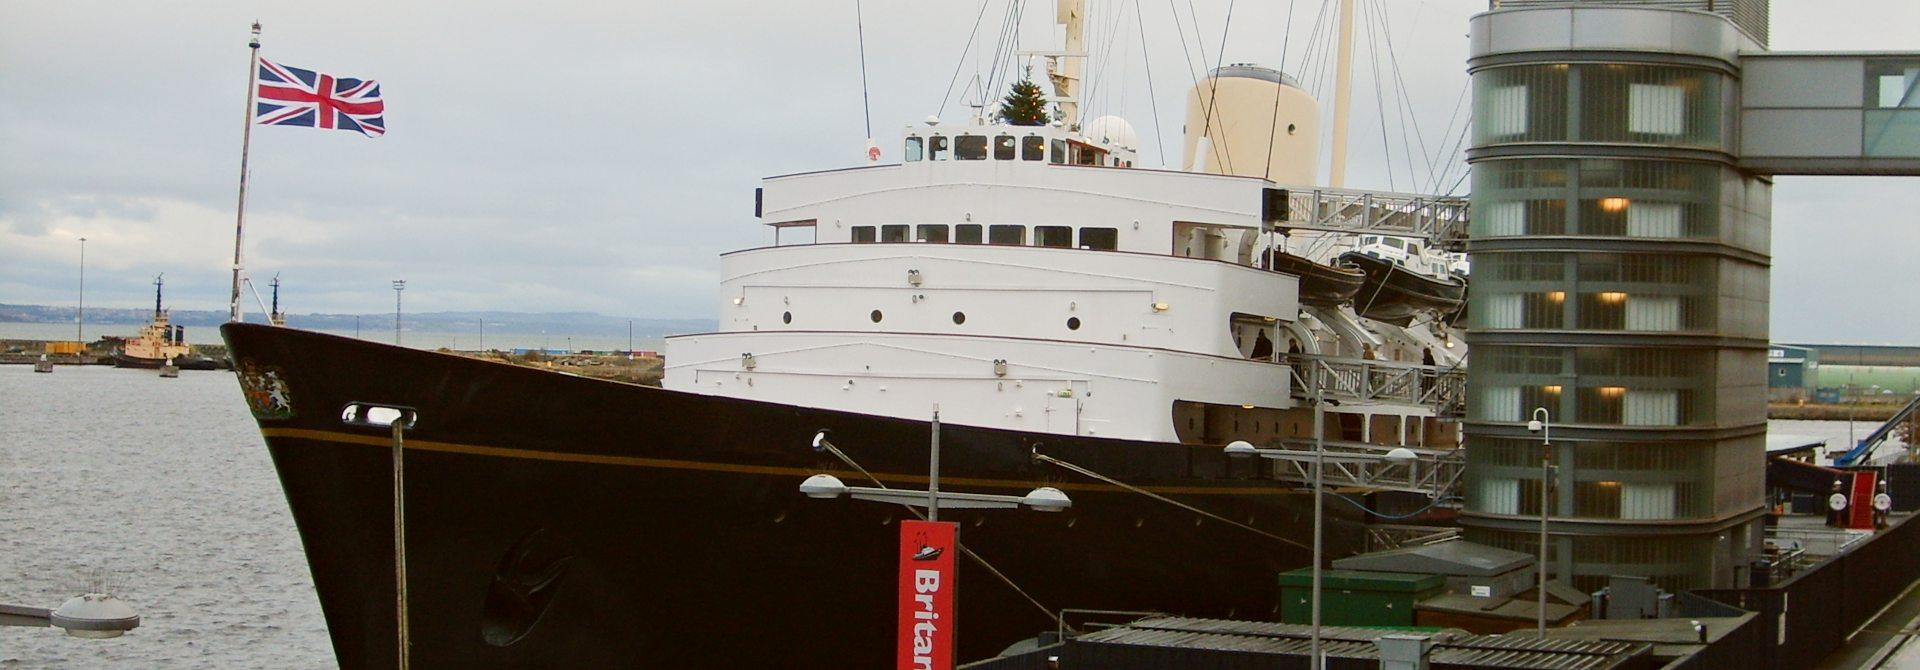 Royal Yacht Header